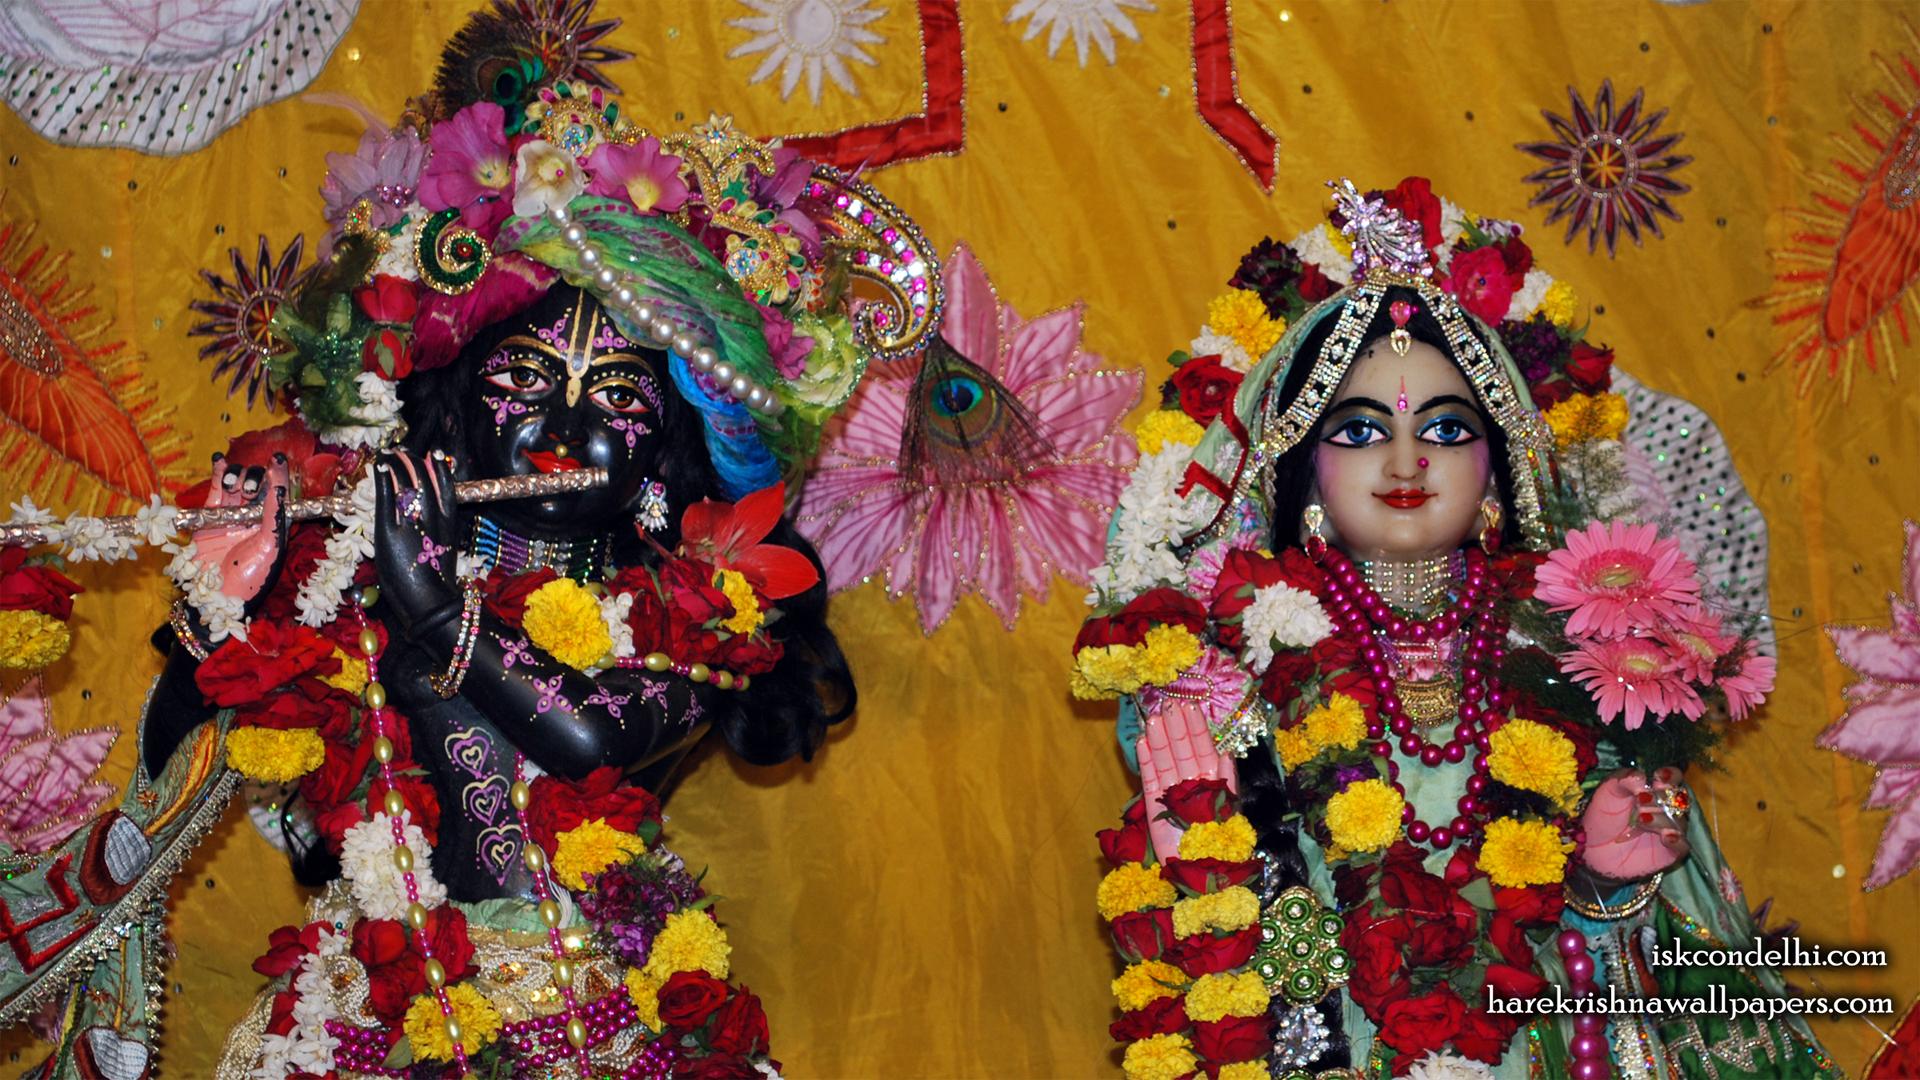 Sri Sri Radha Parthasarathi Close up Wallpaper (005) Size 1920x1080 Download